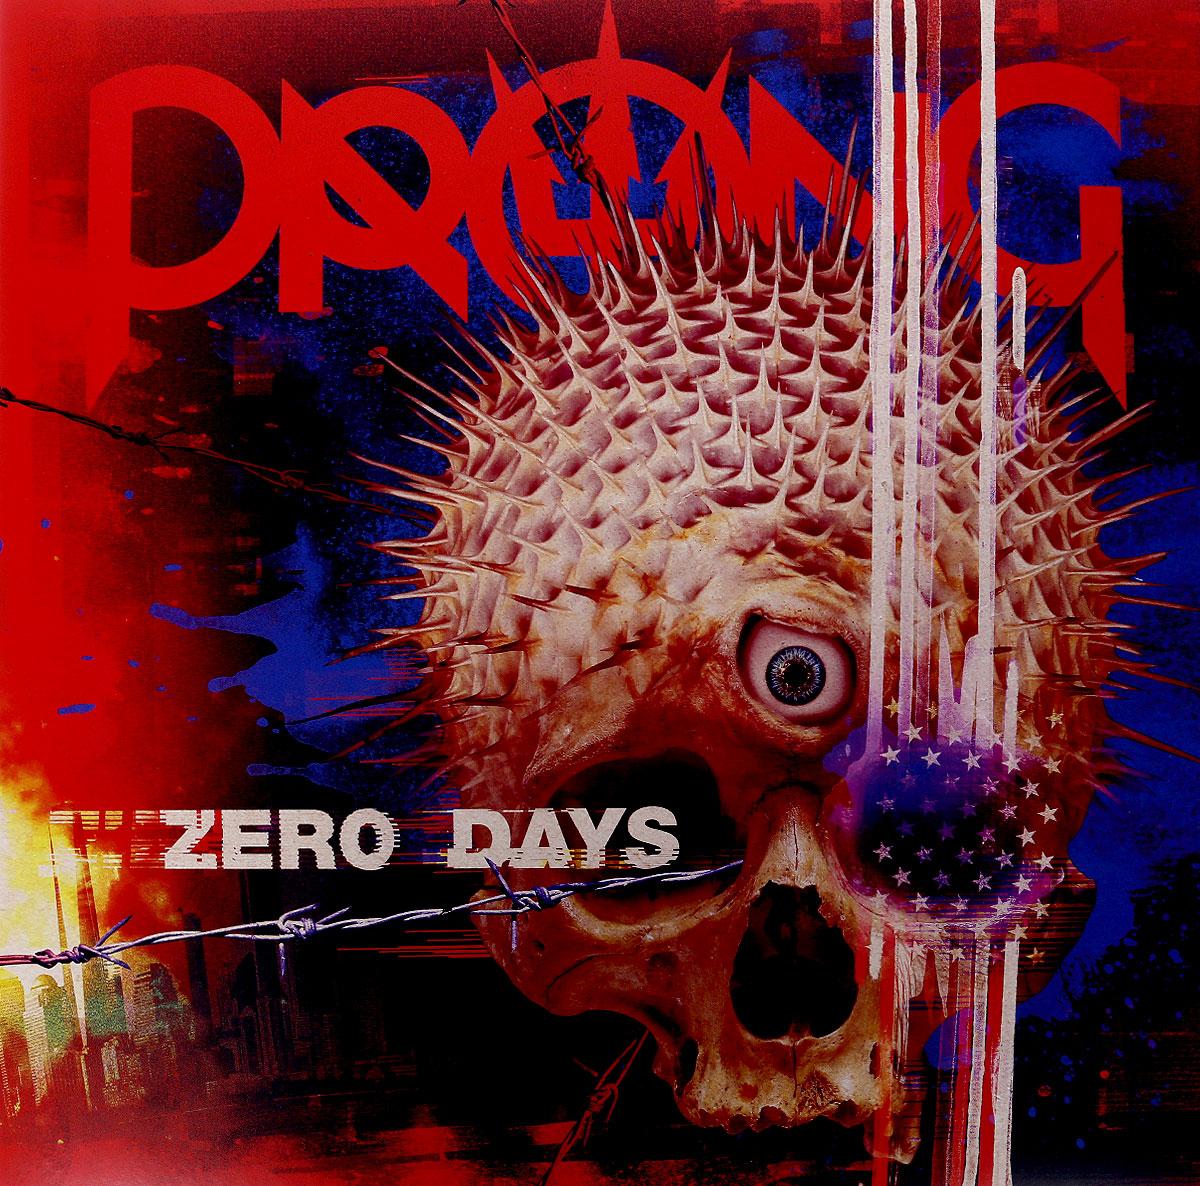 Фото - Prong Prong. Zero Days (2 LP + CD) motogp mugello 2018 2 days pass